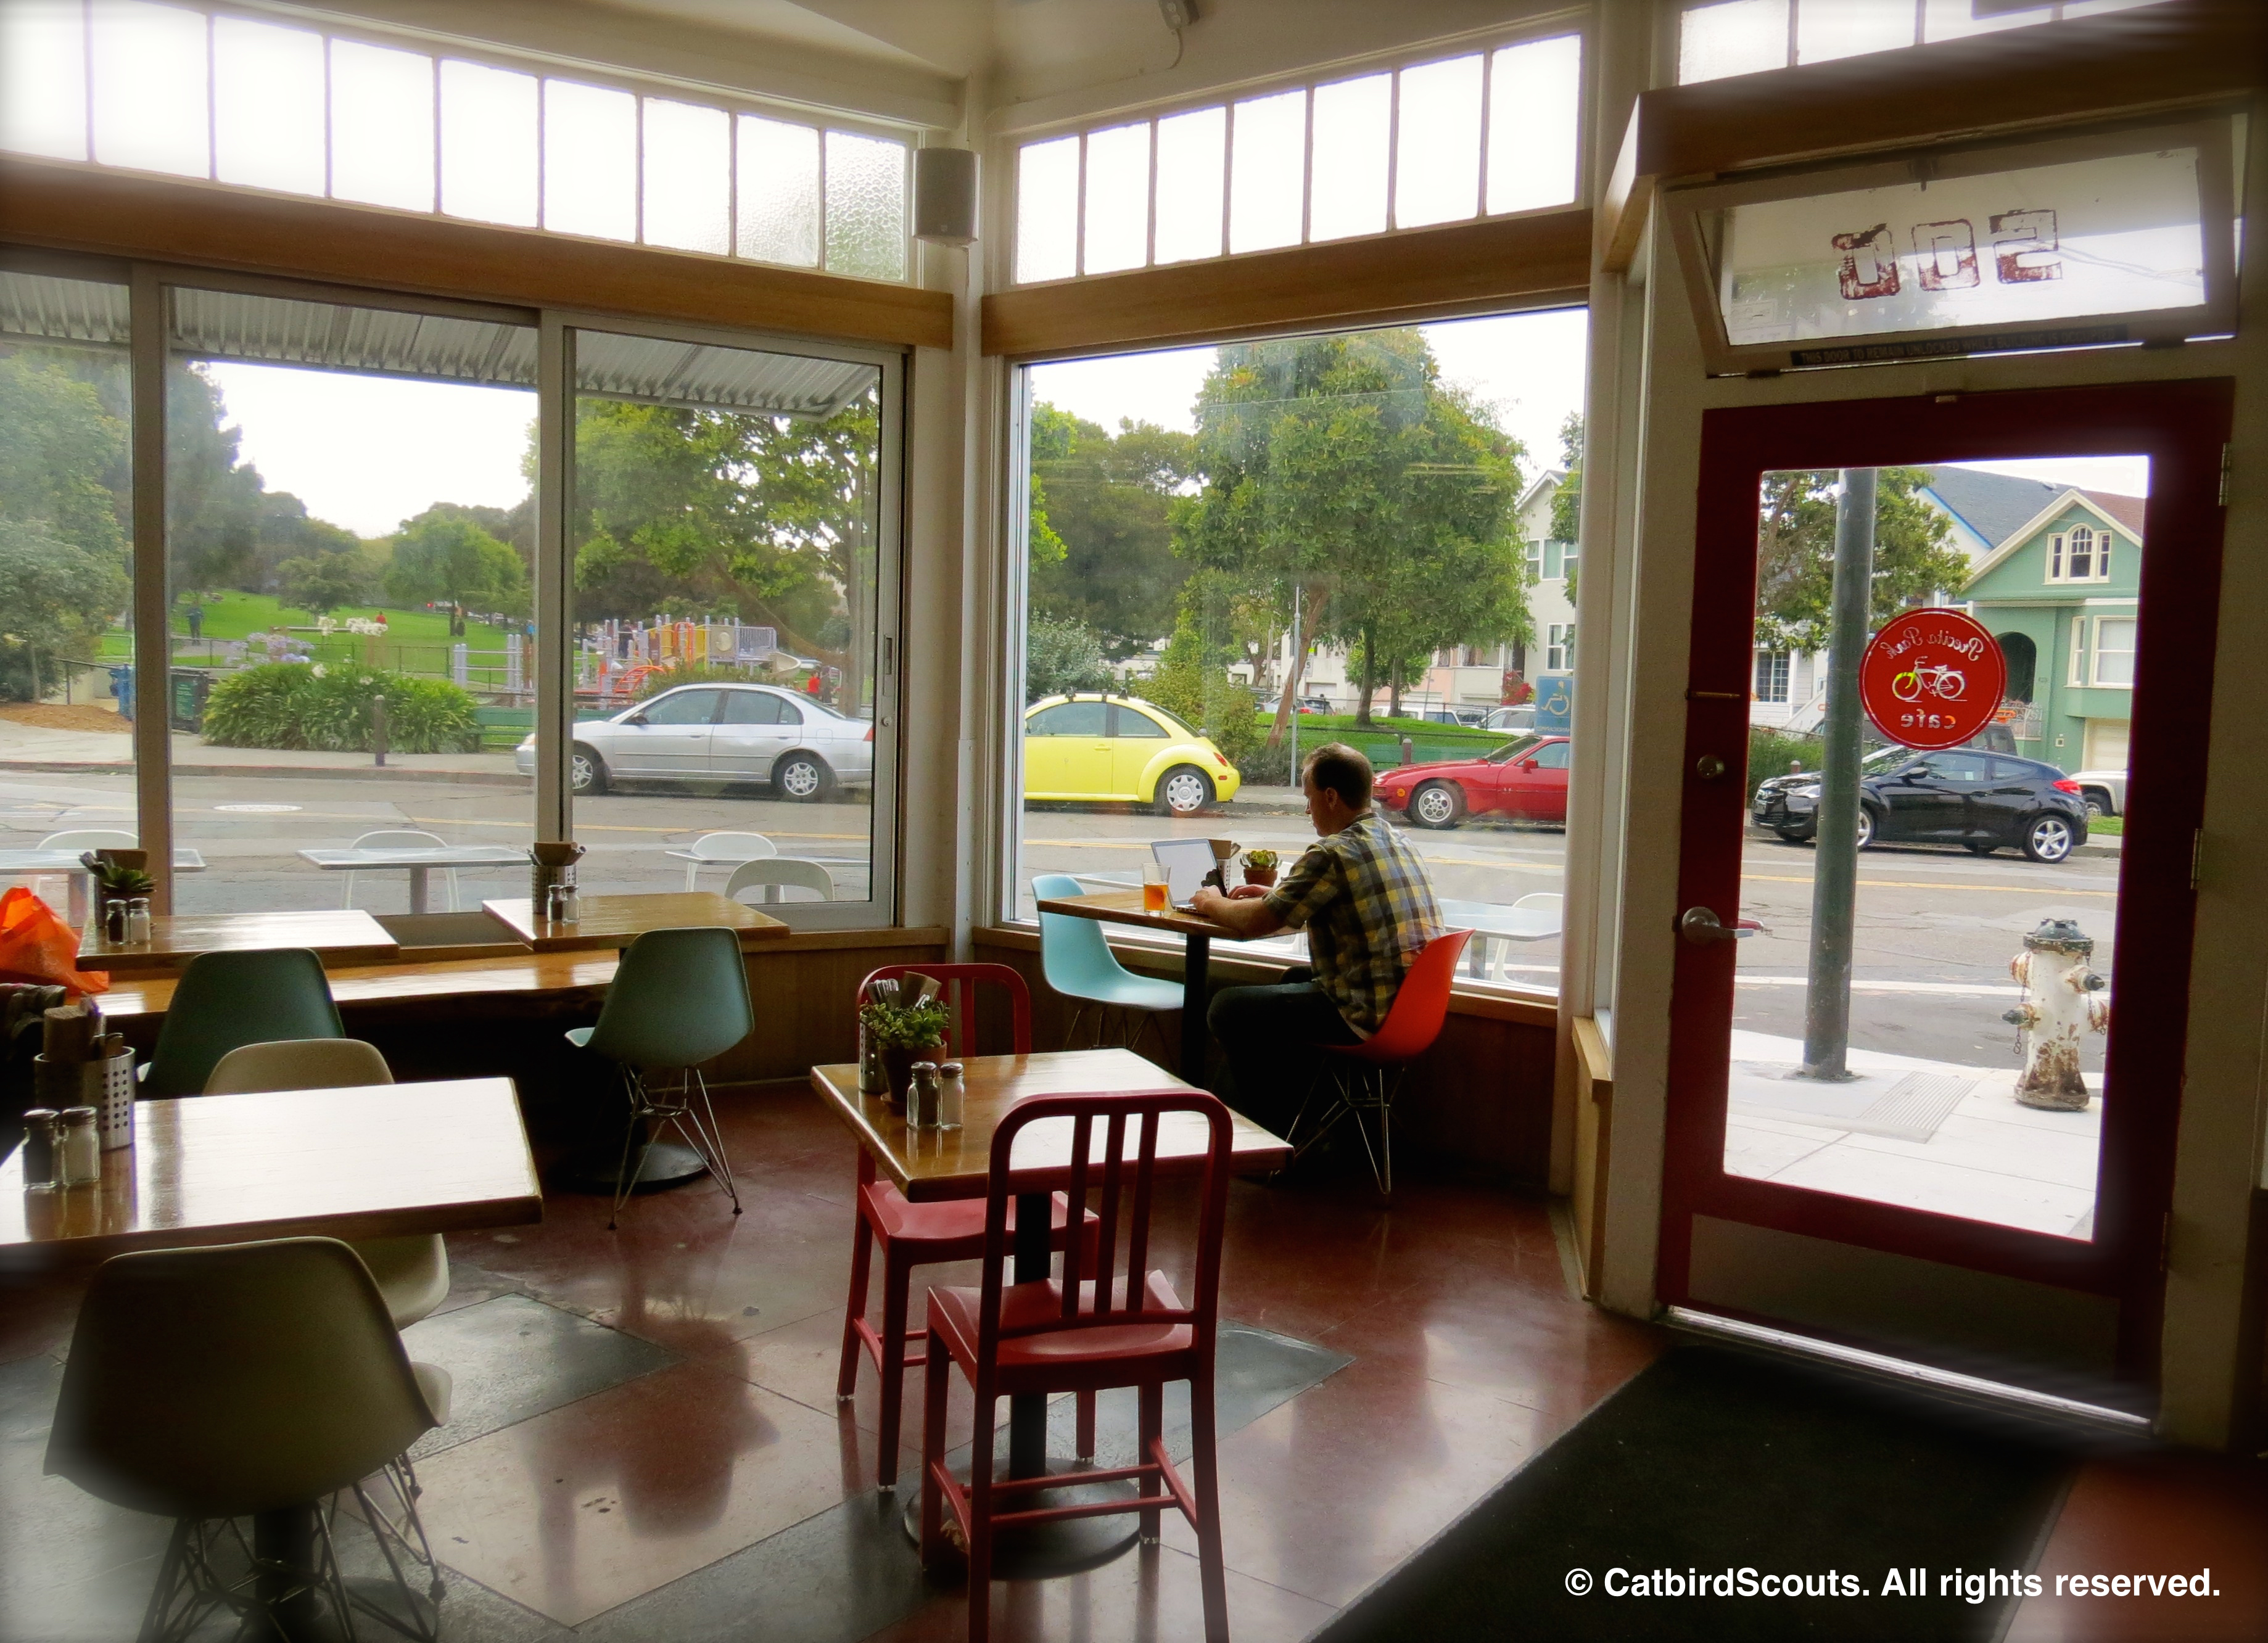 CoffeeShop-Catbird-Scouts